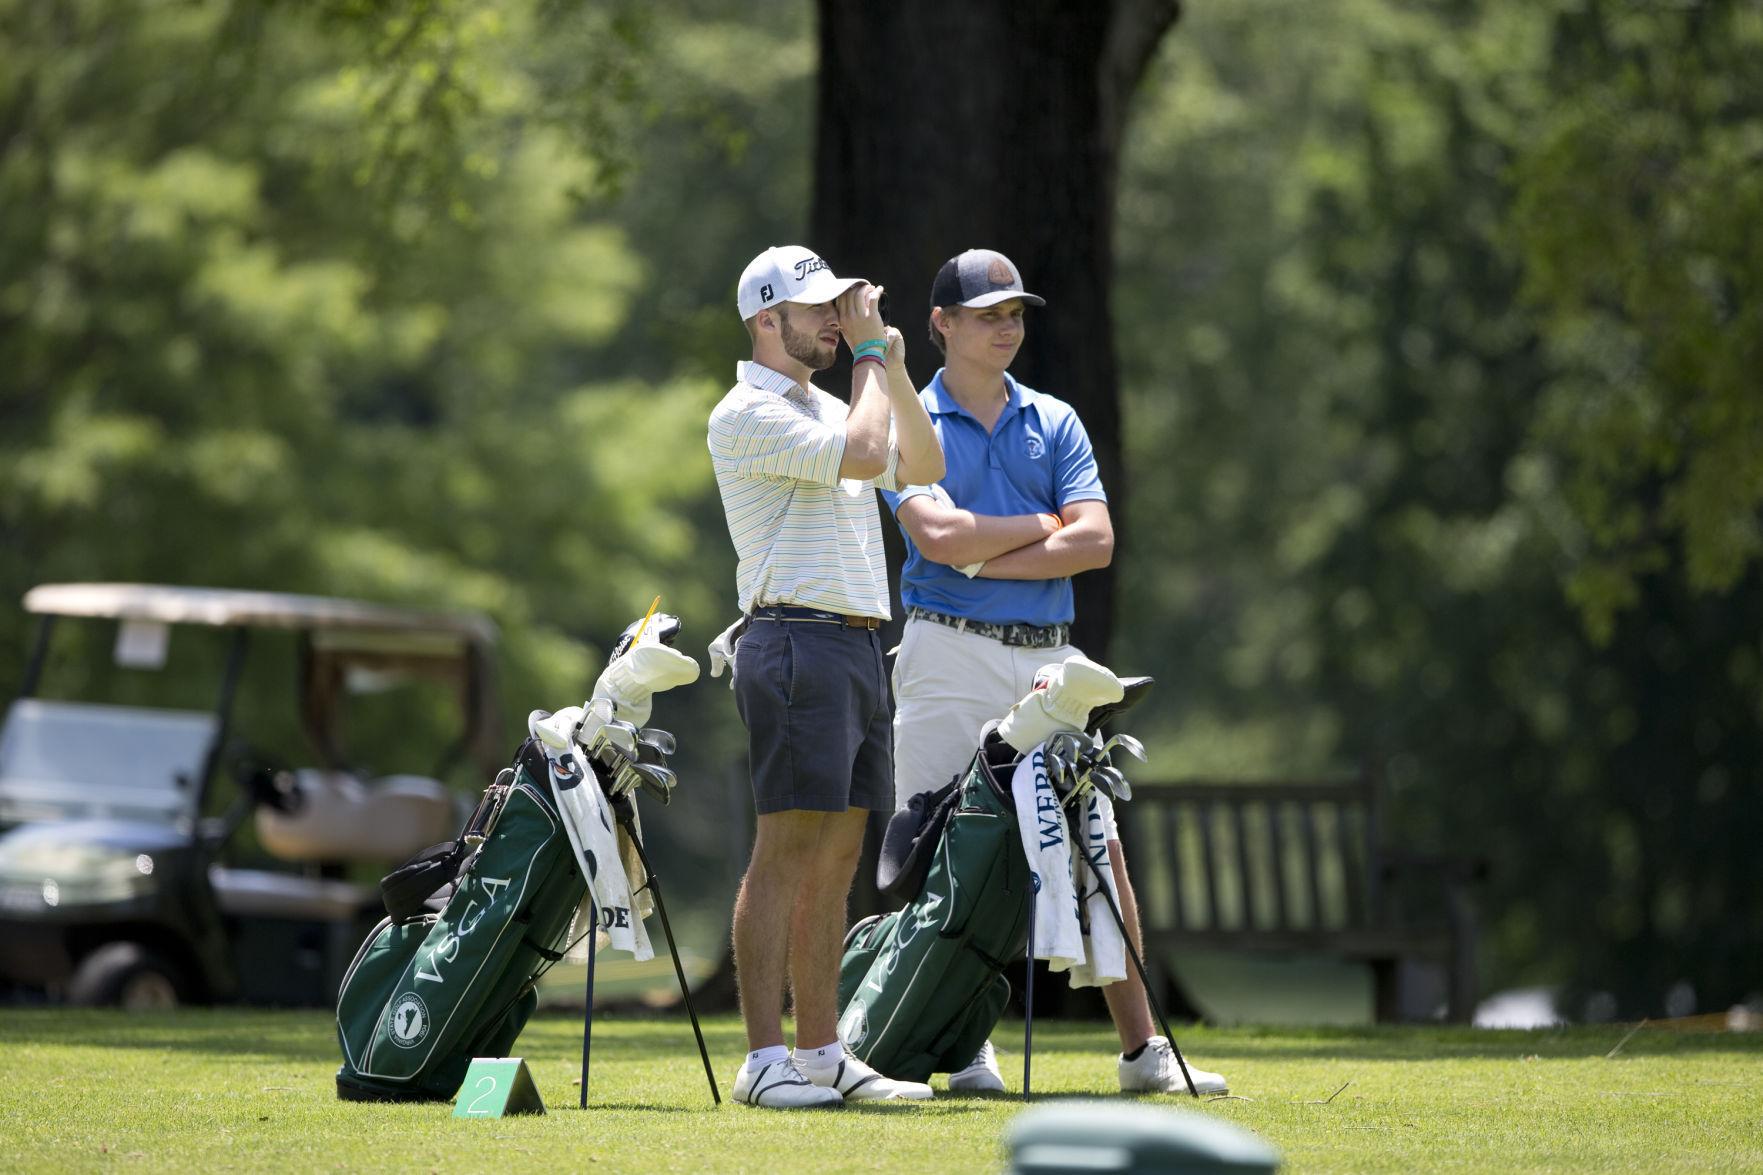 2019 Roanoke Valley Golf Hall of Fame Scholarship Winners